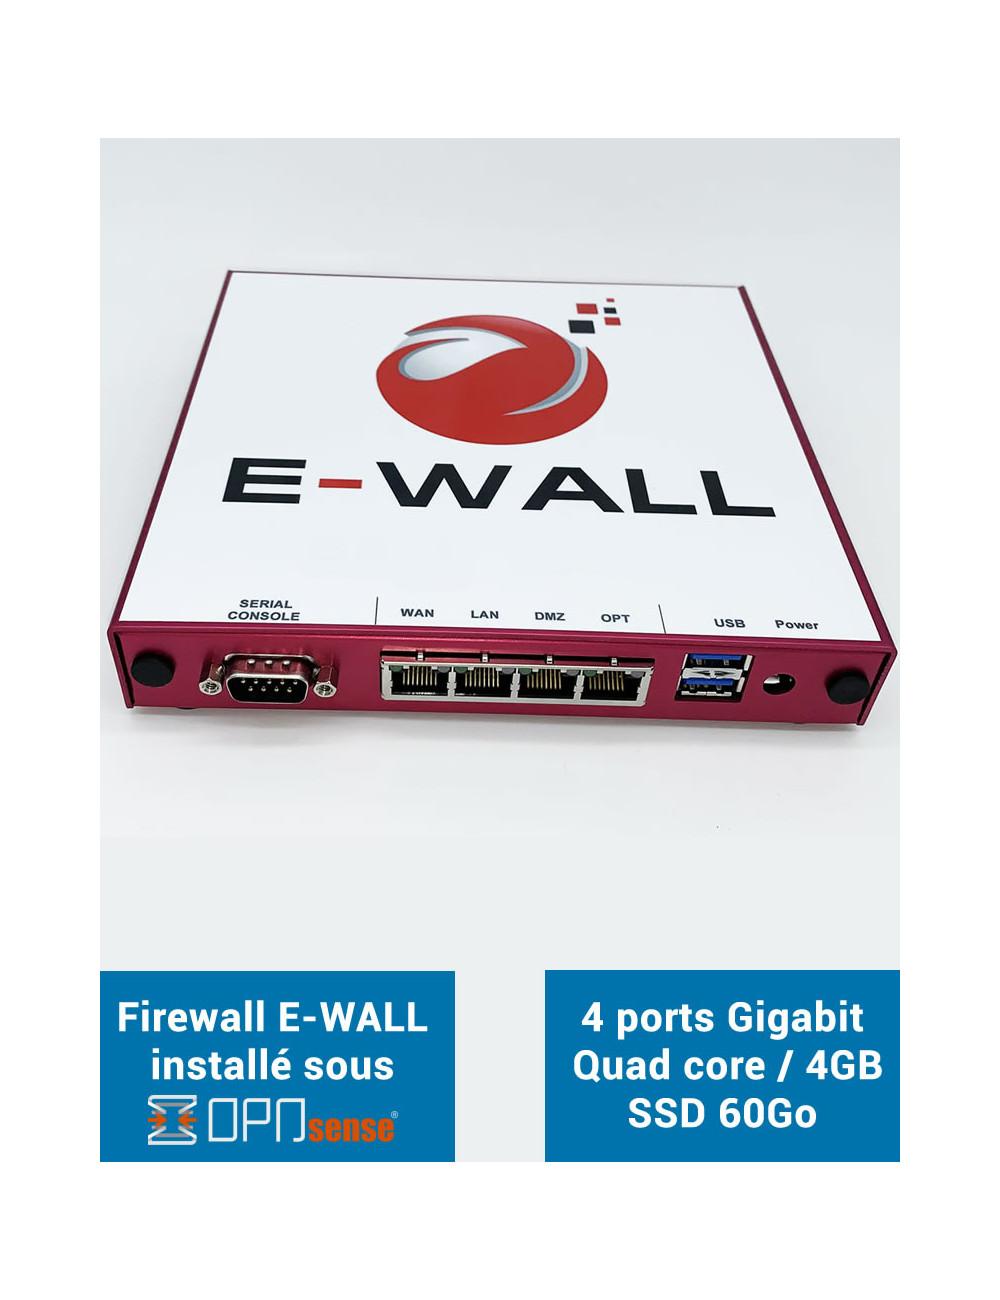 E-WALL SYNOLOGY Server NAS - Backup 300 GB - 1 year